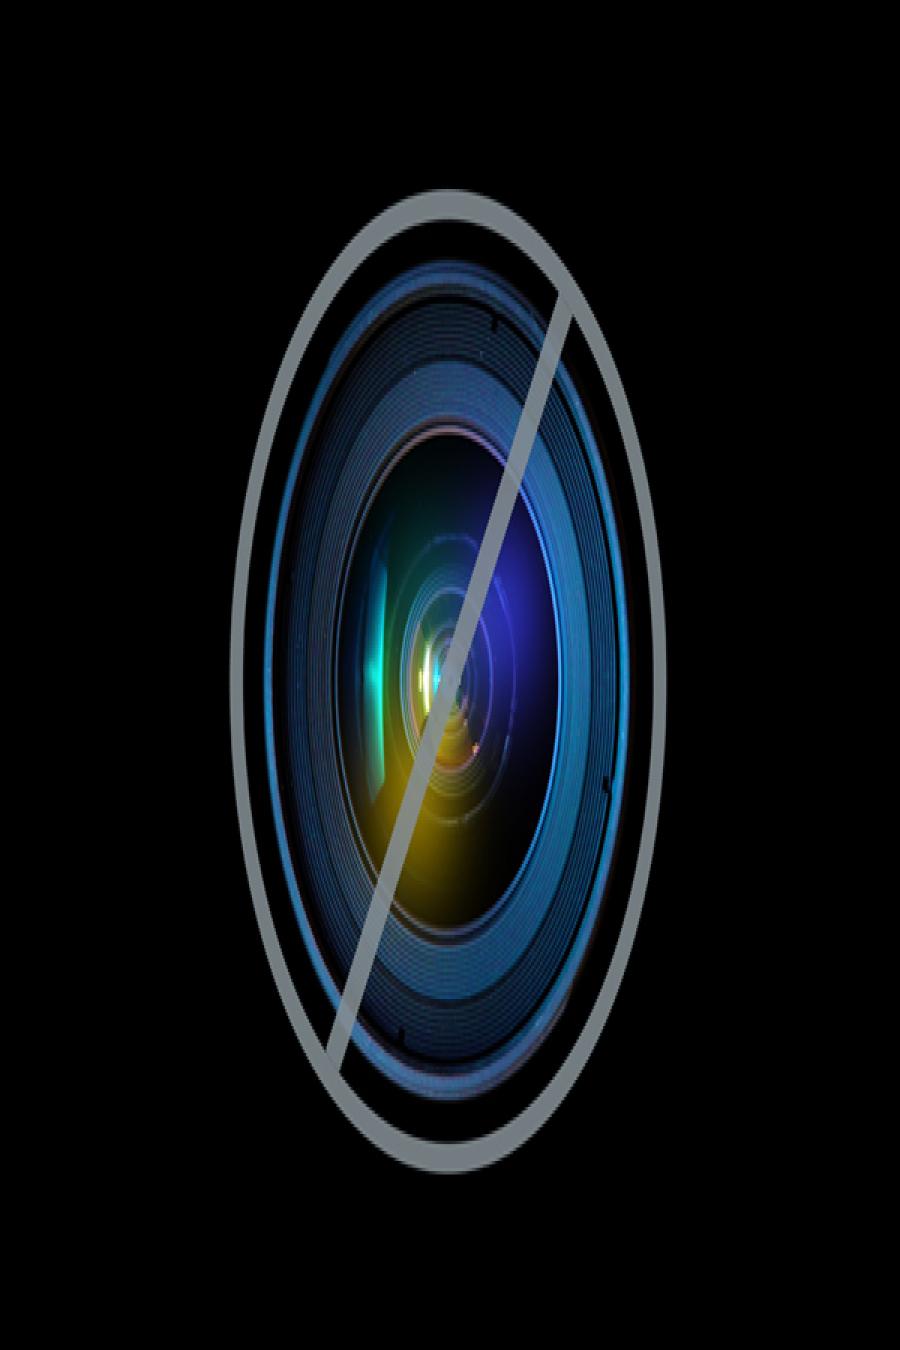 moving image 2